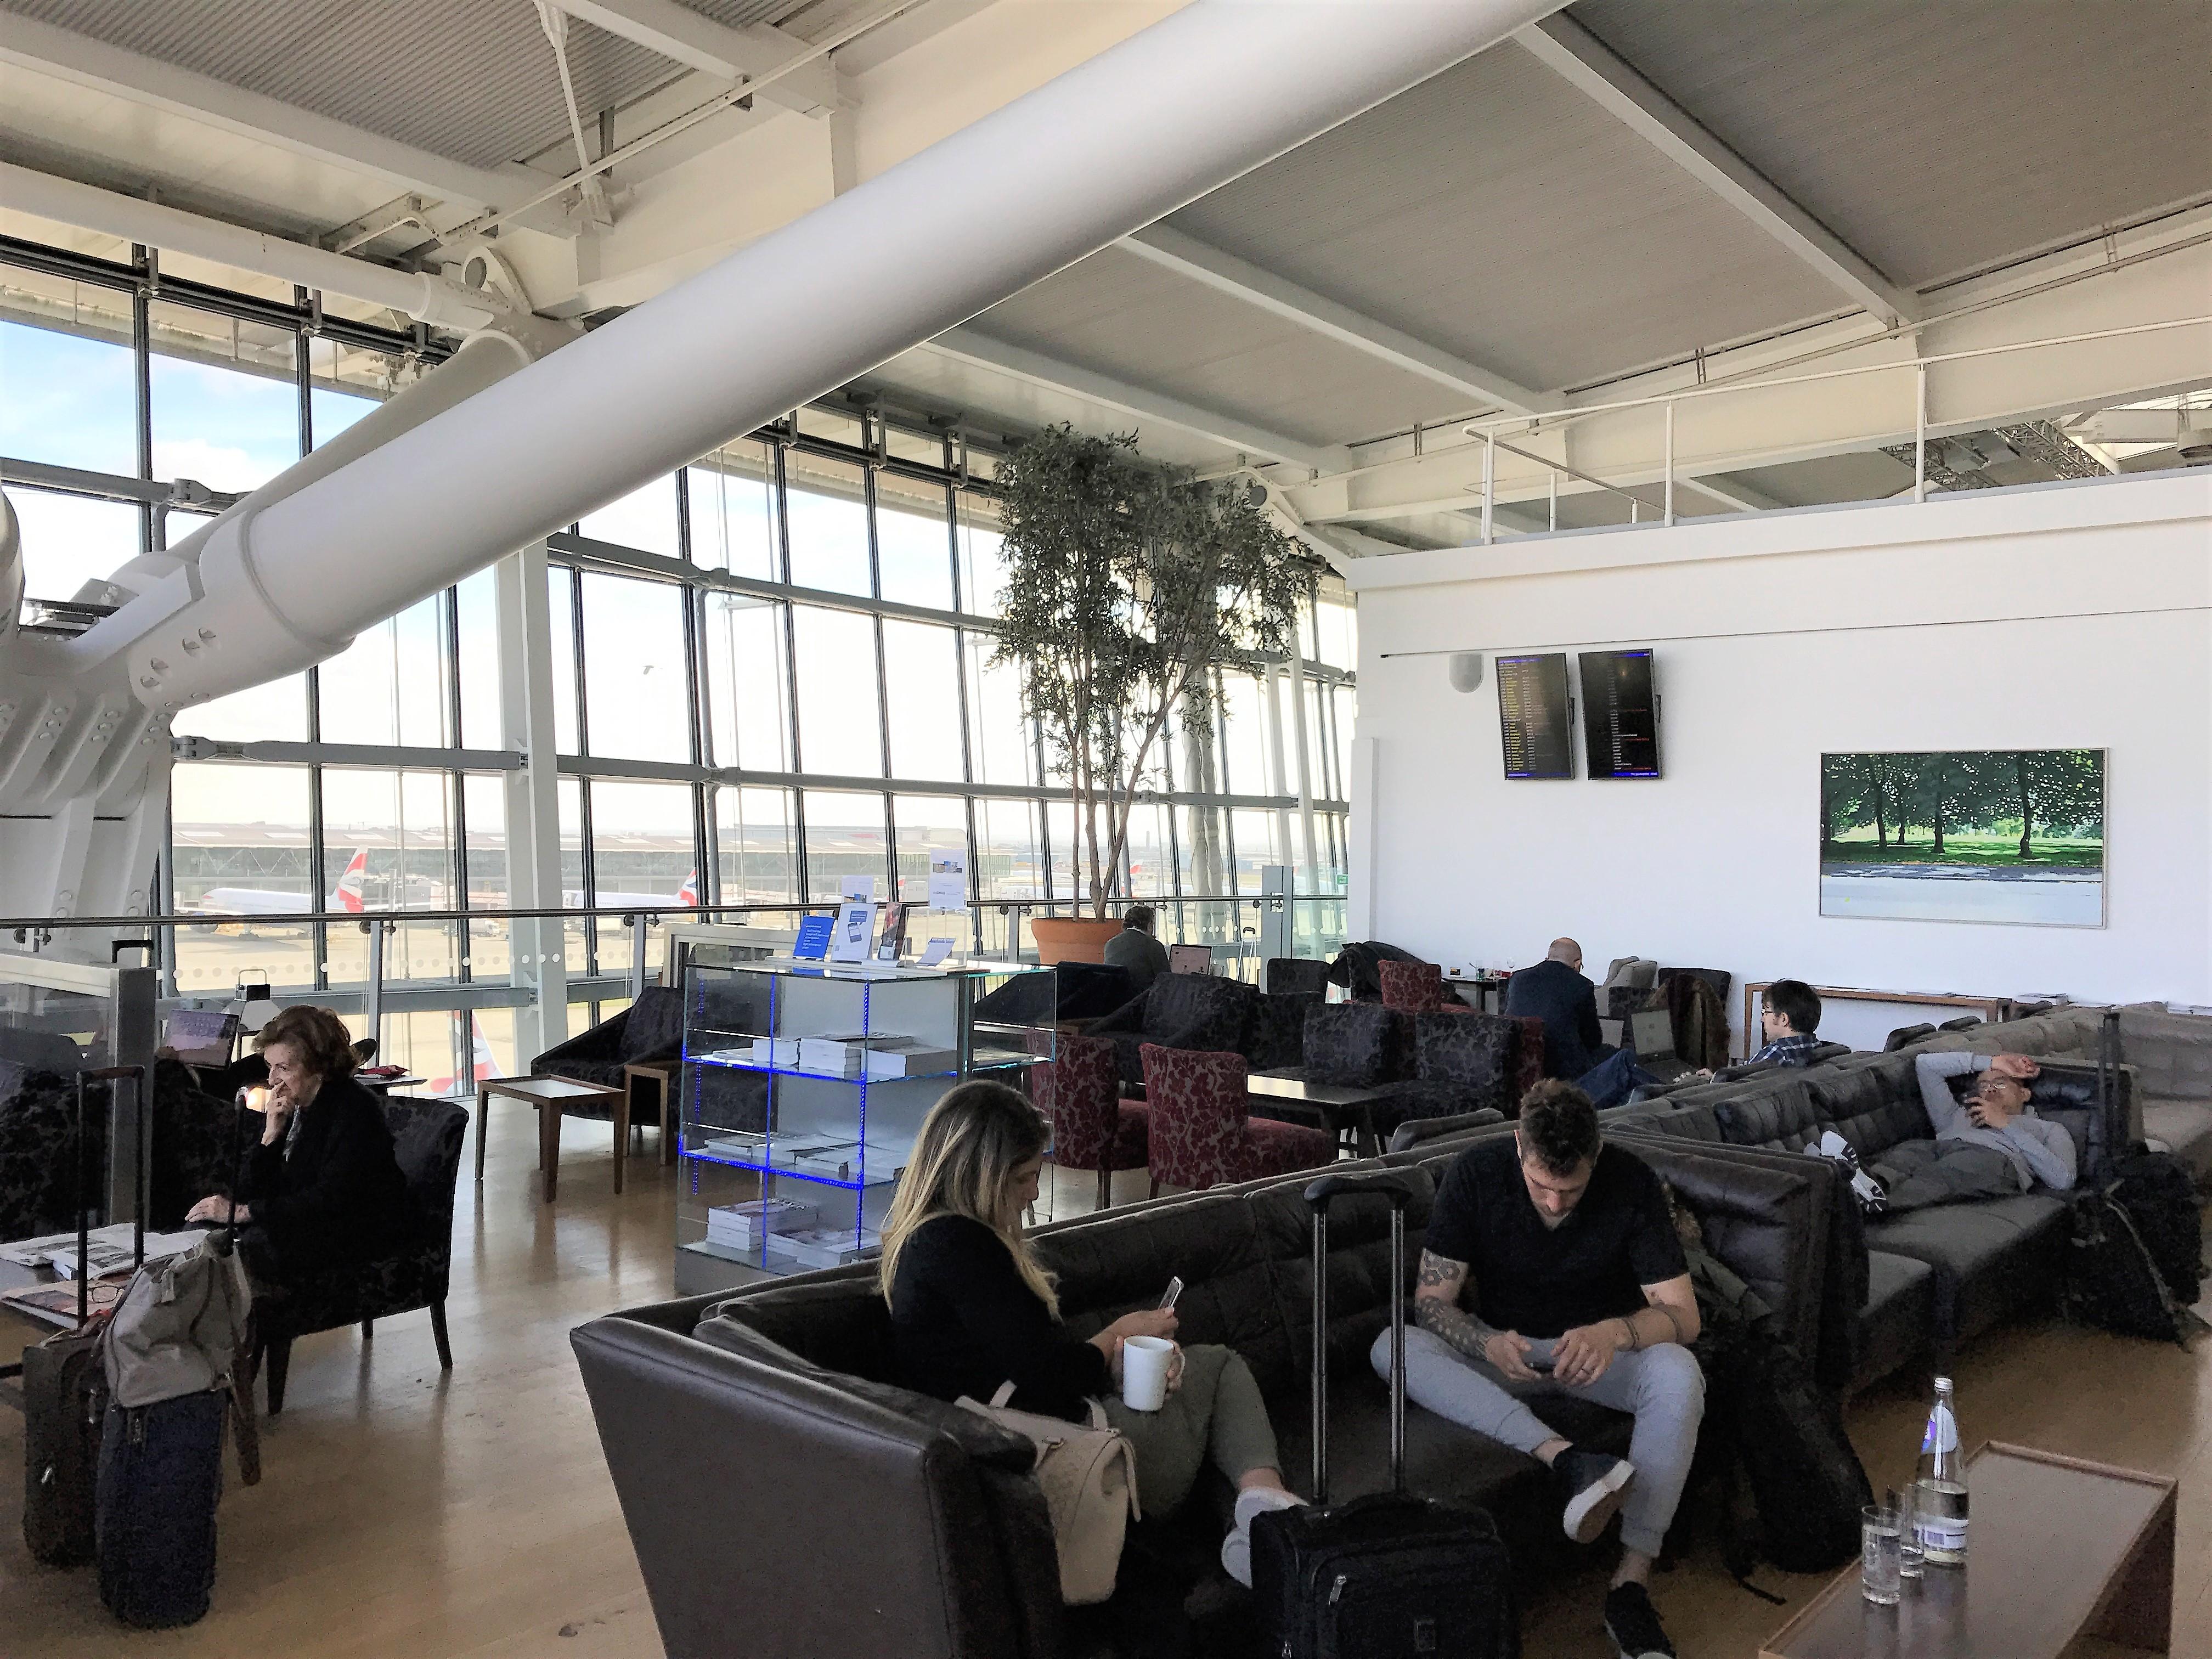 BA Heathrow club lounge review